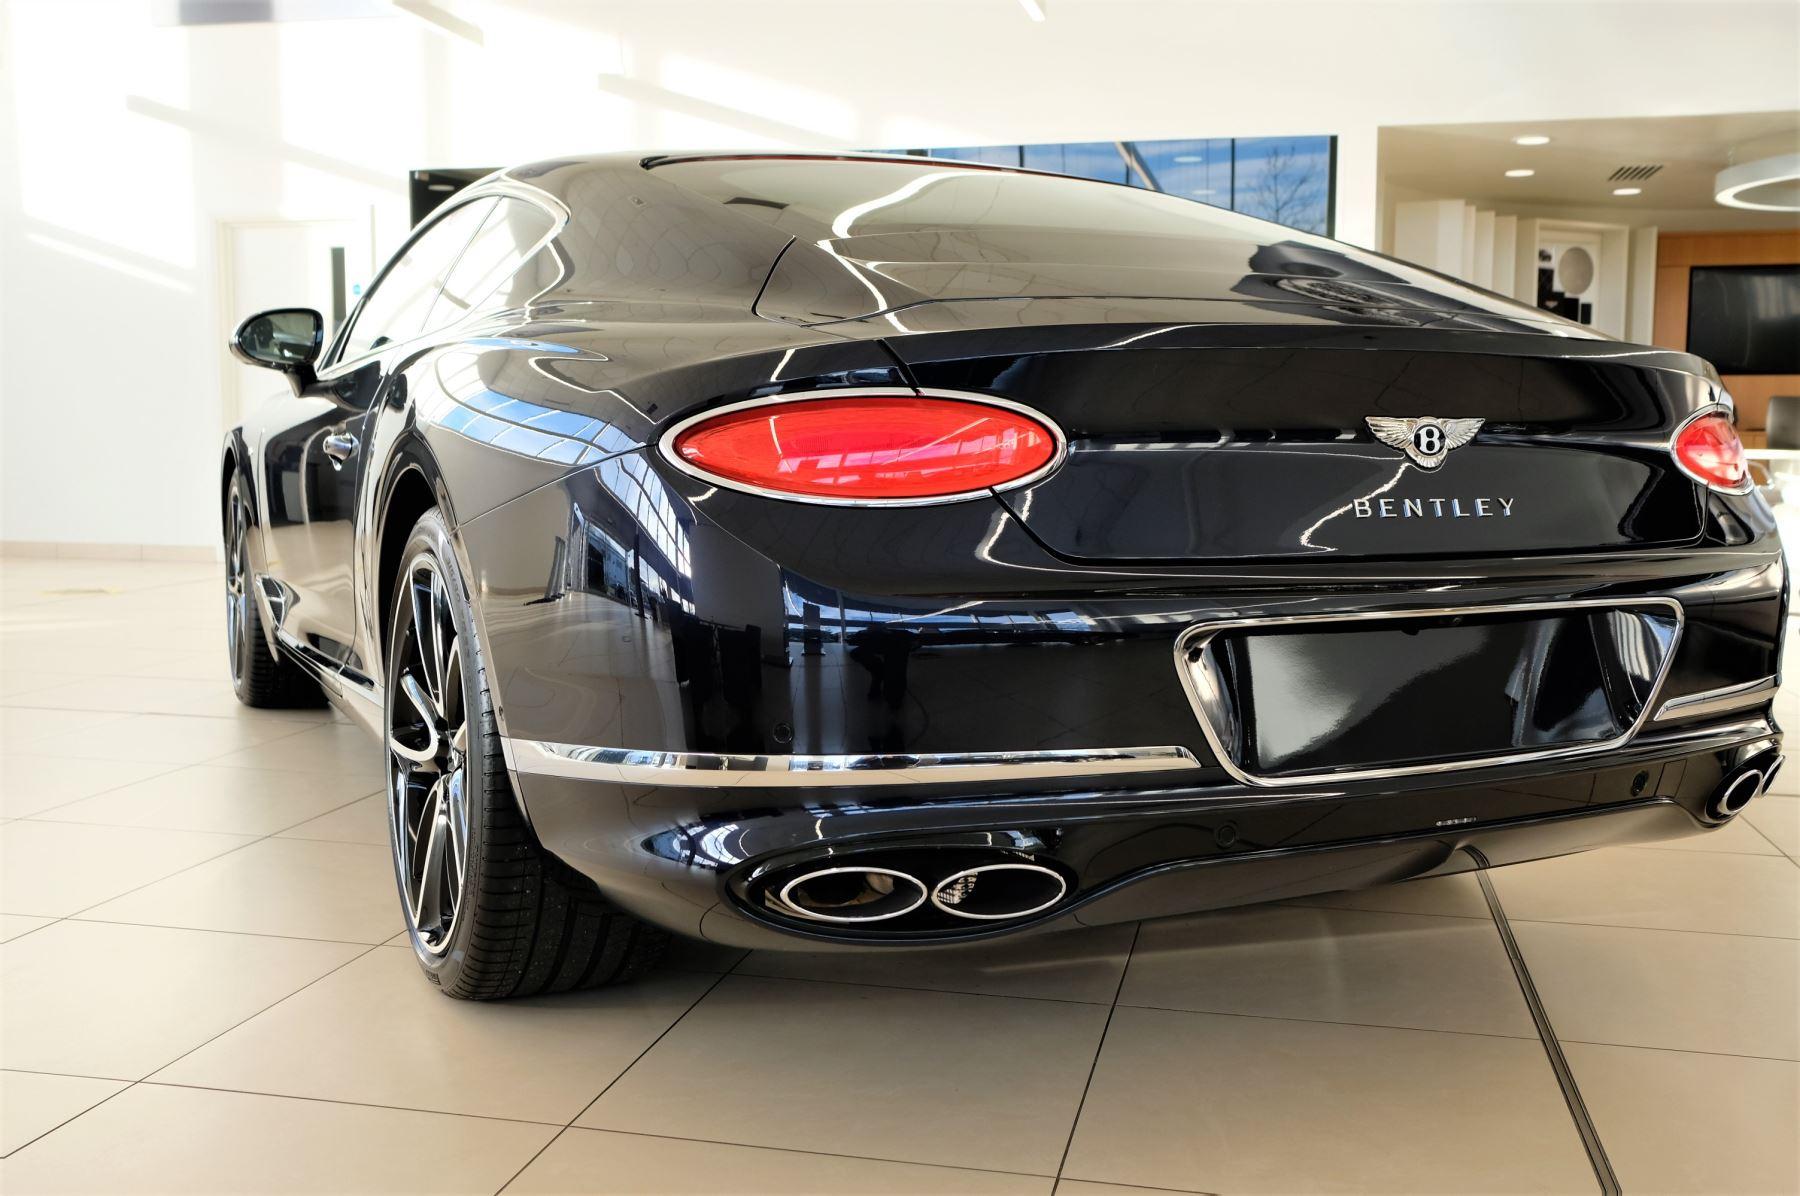 Bentley Continental GT 4.0 V8 Mulliner Edition Auto [Tour Spec] image 5